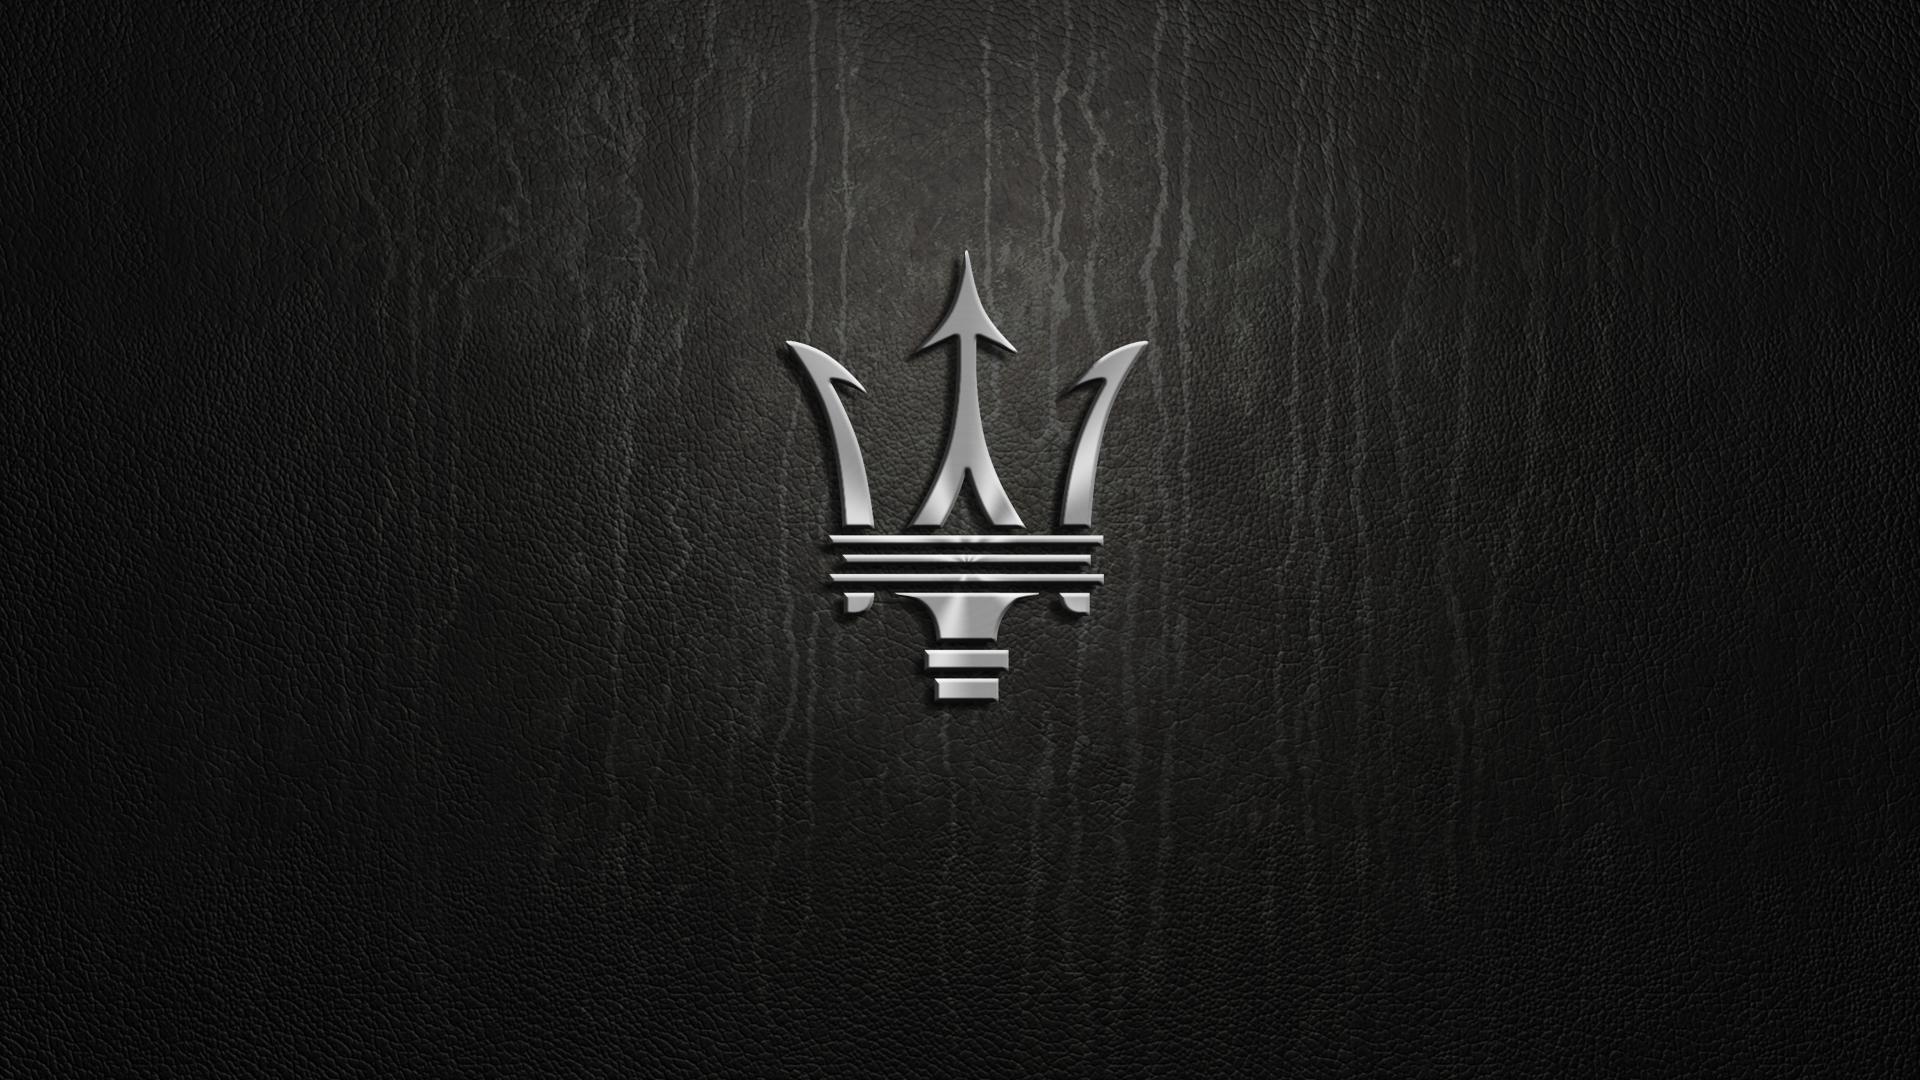 maserati logo Logo wallpaper hd Maserati Maserati granturismo 1920x1080